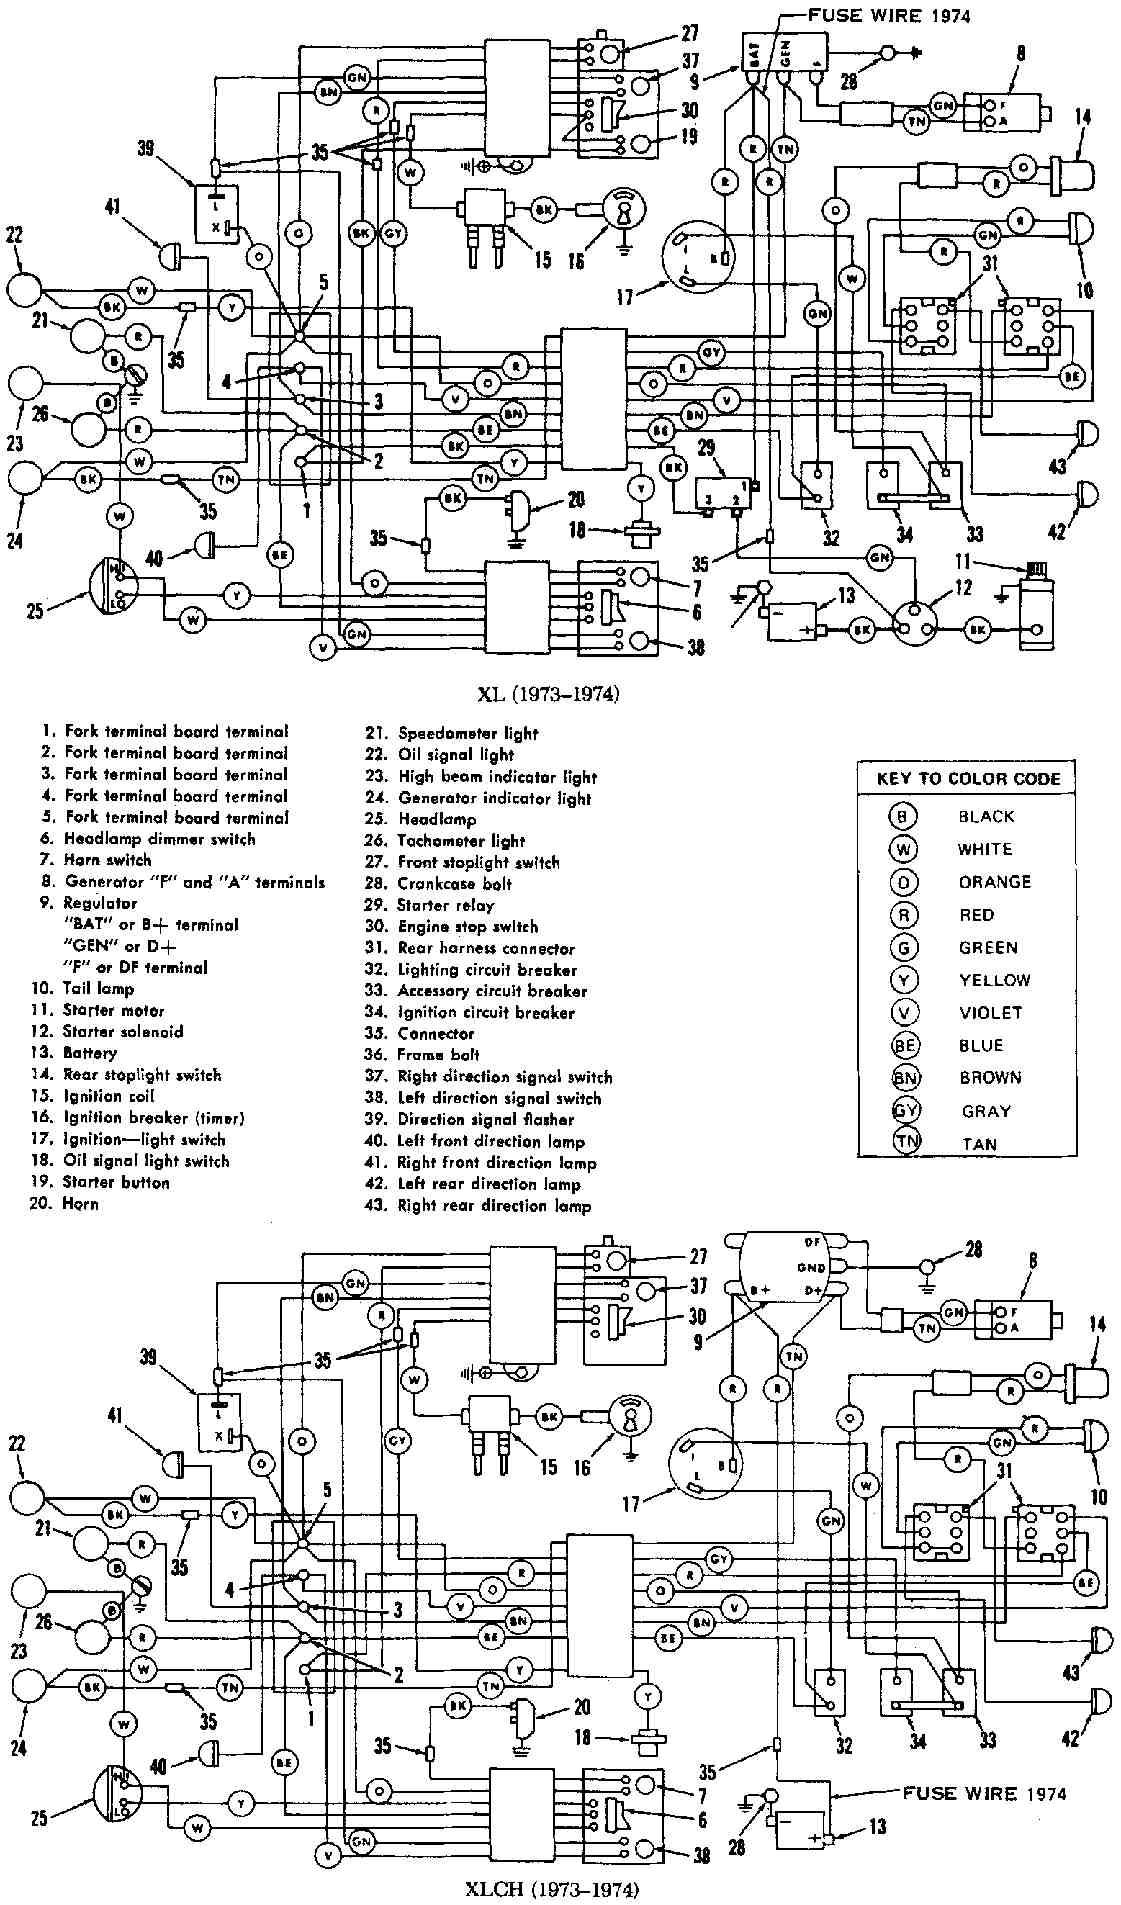 harley flh wiring harness diagram wiring diagram harley shovelhead oil cooler harley flh wire harness schematic [ 1121 x 1905 Pixel ]